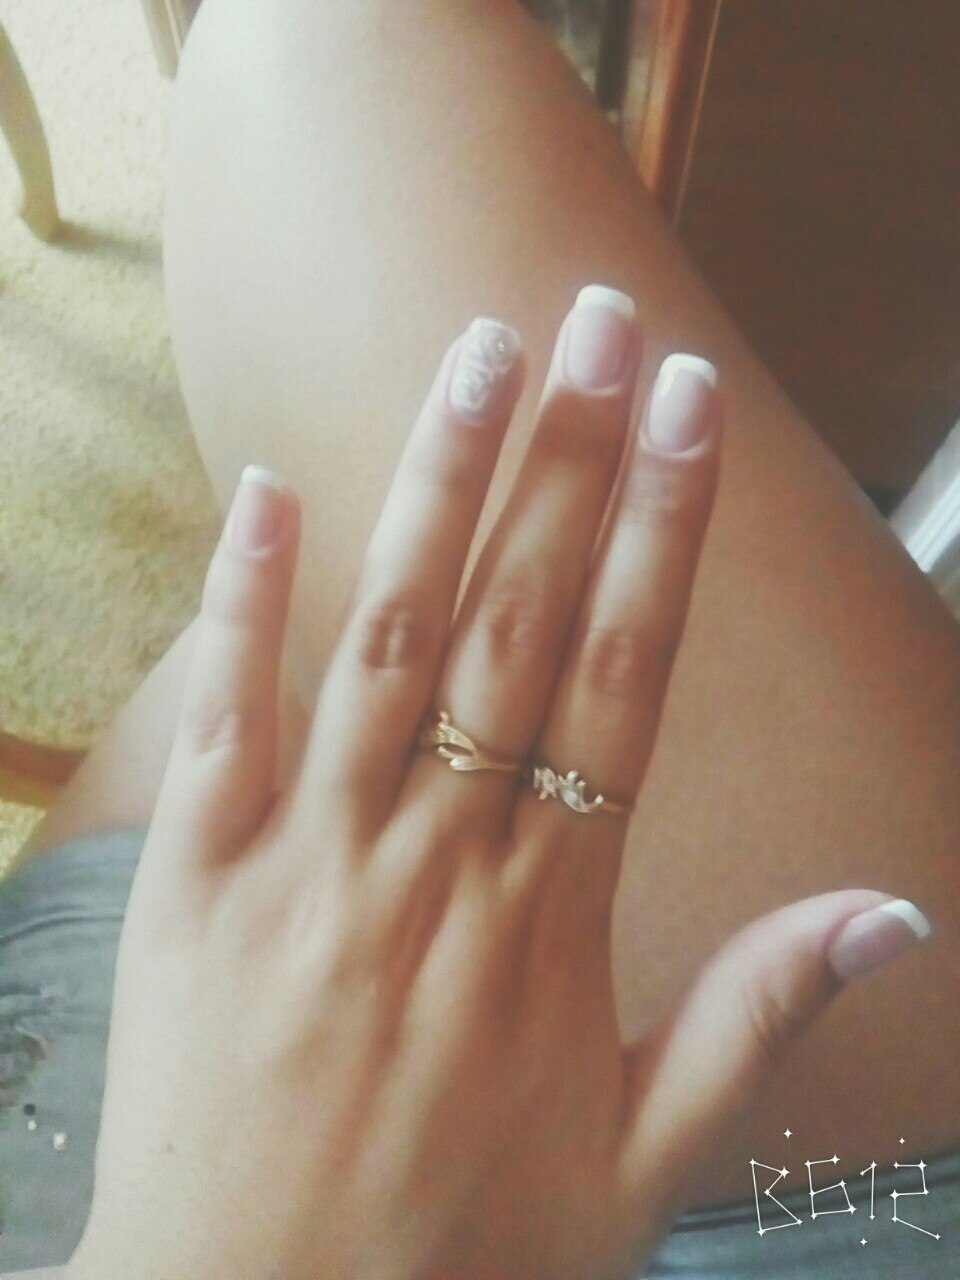 Маникюр для коротких ногтей гламурного типа для повседневки